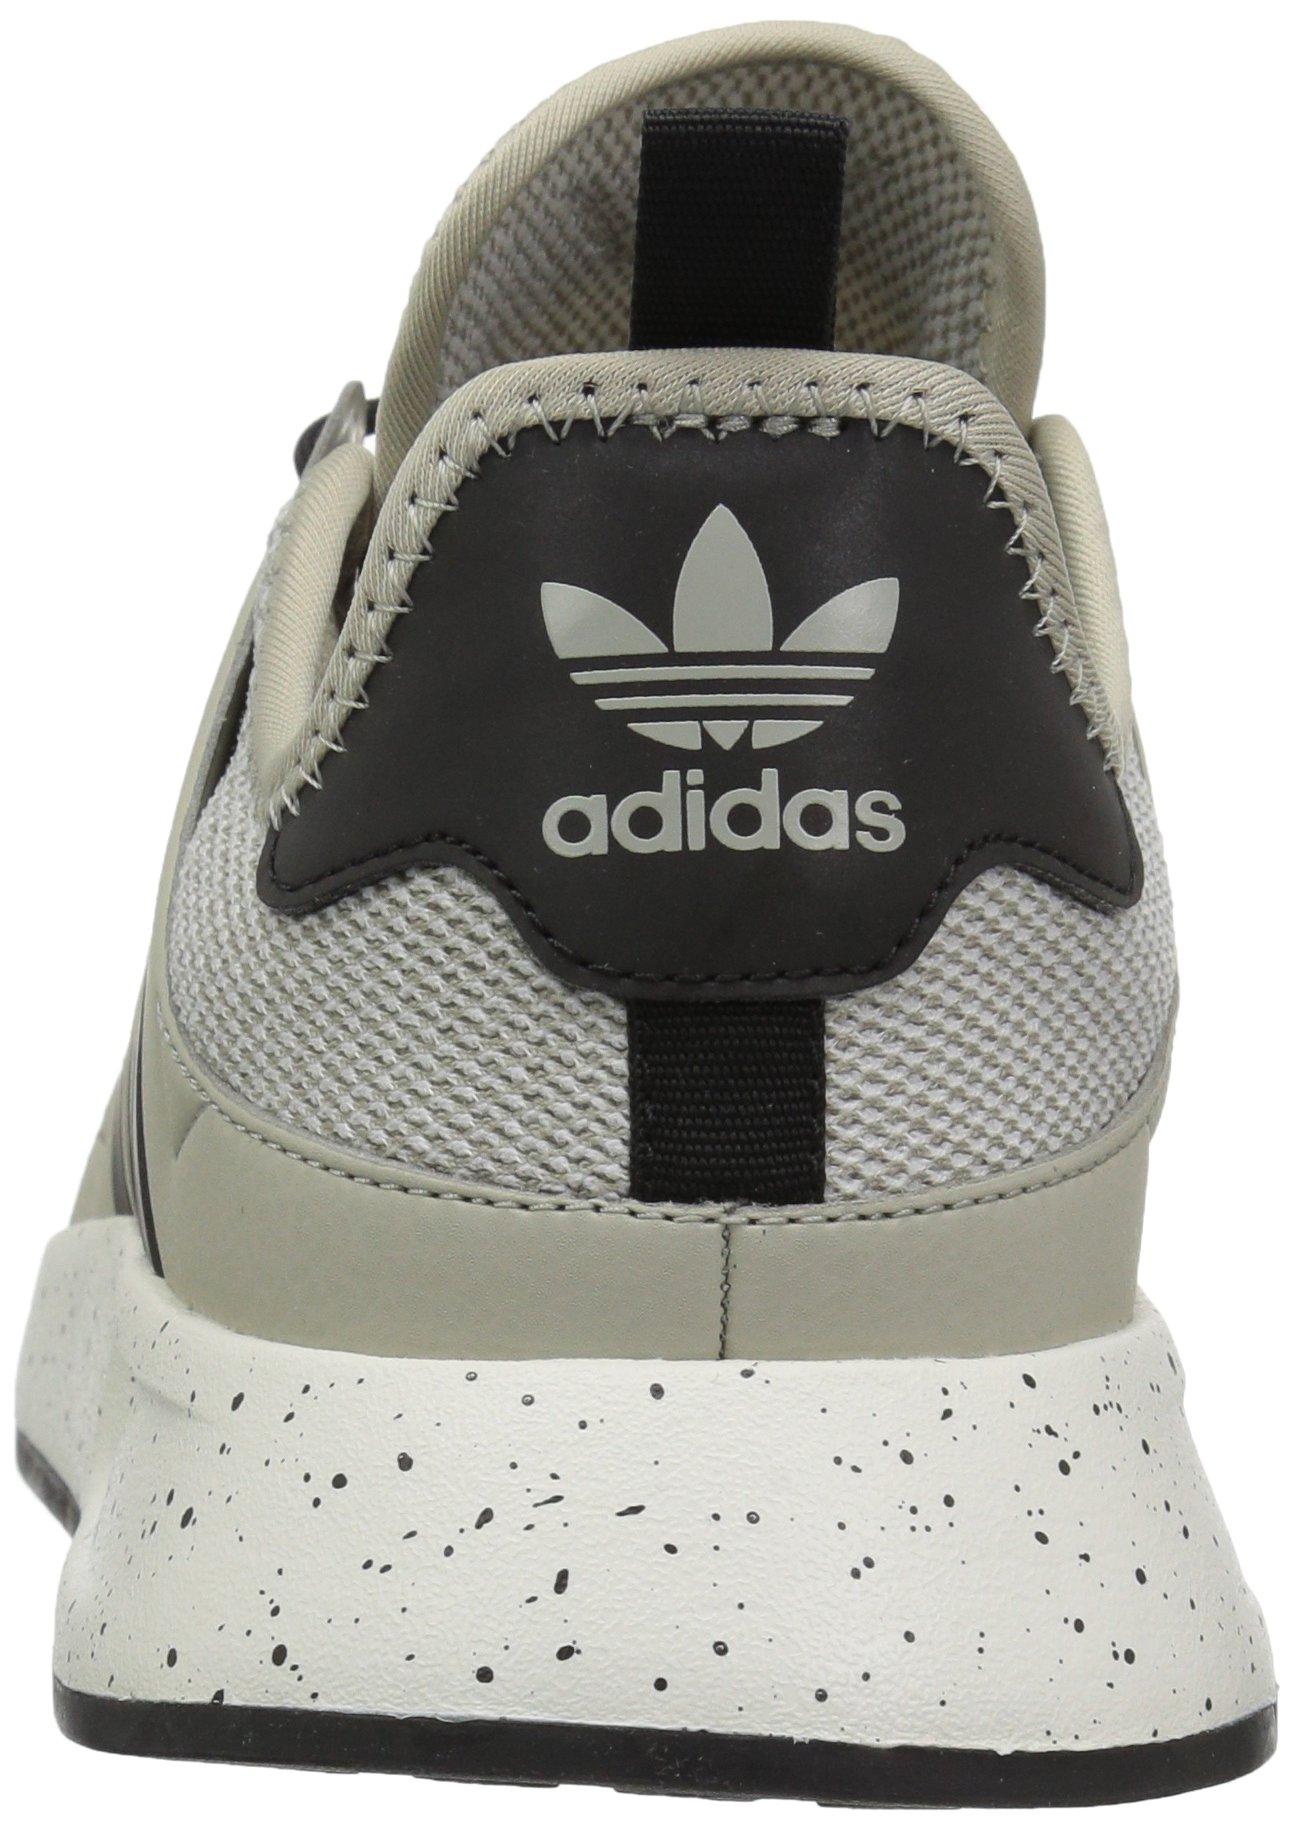 adidas Originals Mens X_PLR Running Shoe Sneaker Black/Sesame, 4.5 M US by adidas Originals (Image #2)